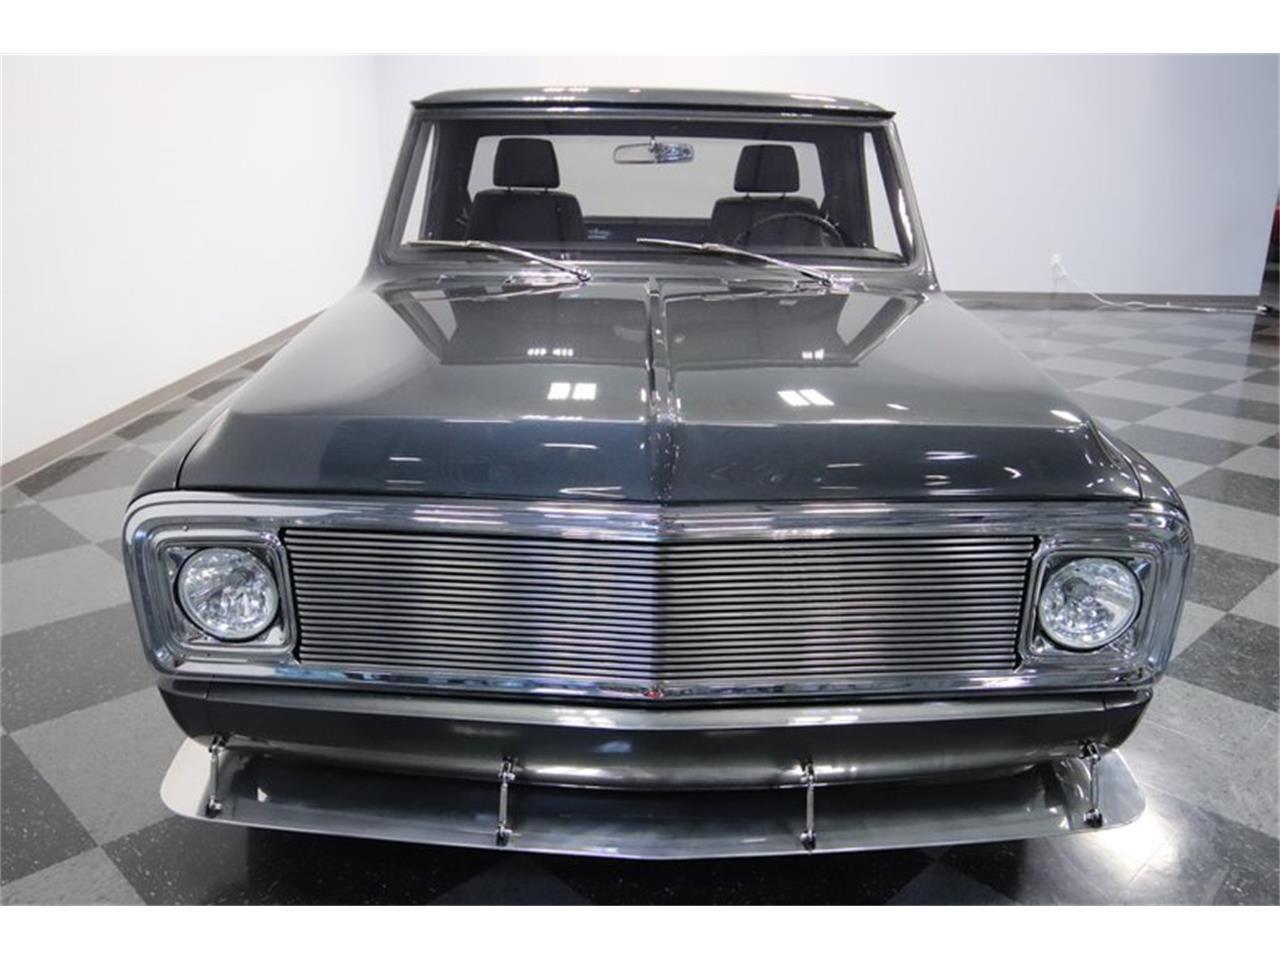 Large Picture of Classic 1970 C10 located in Arizona - $58,995.00 - NIMH